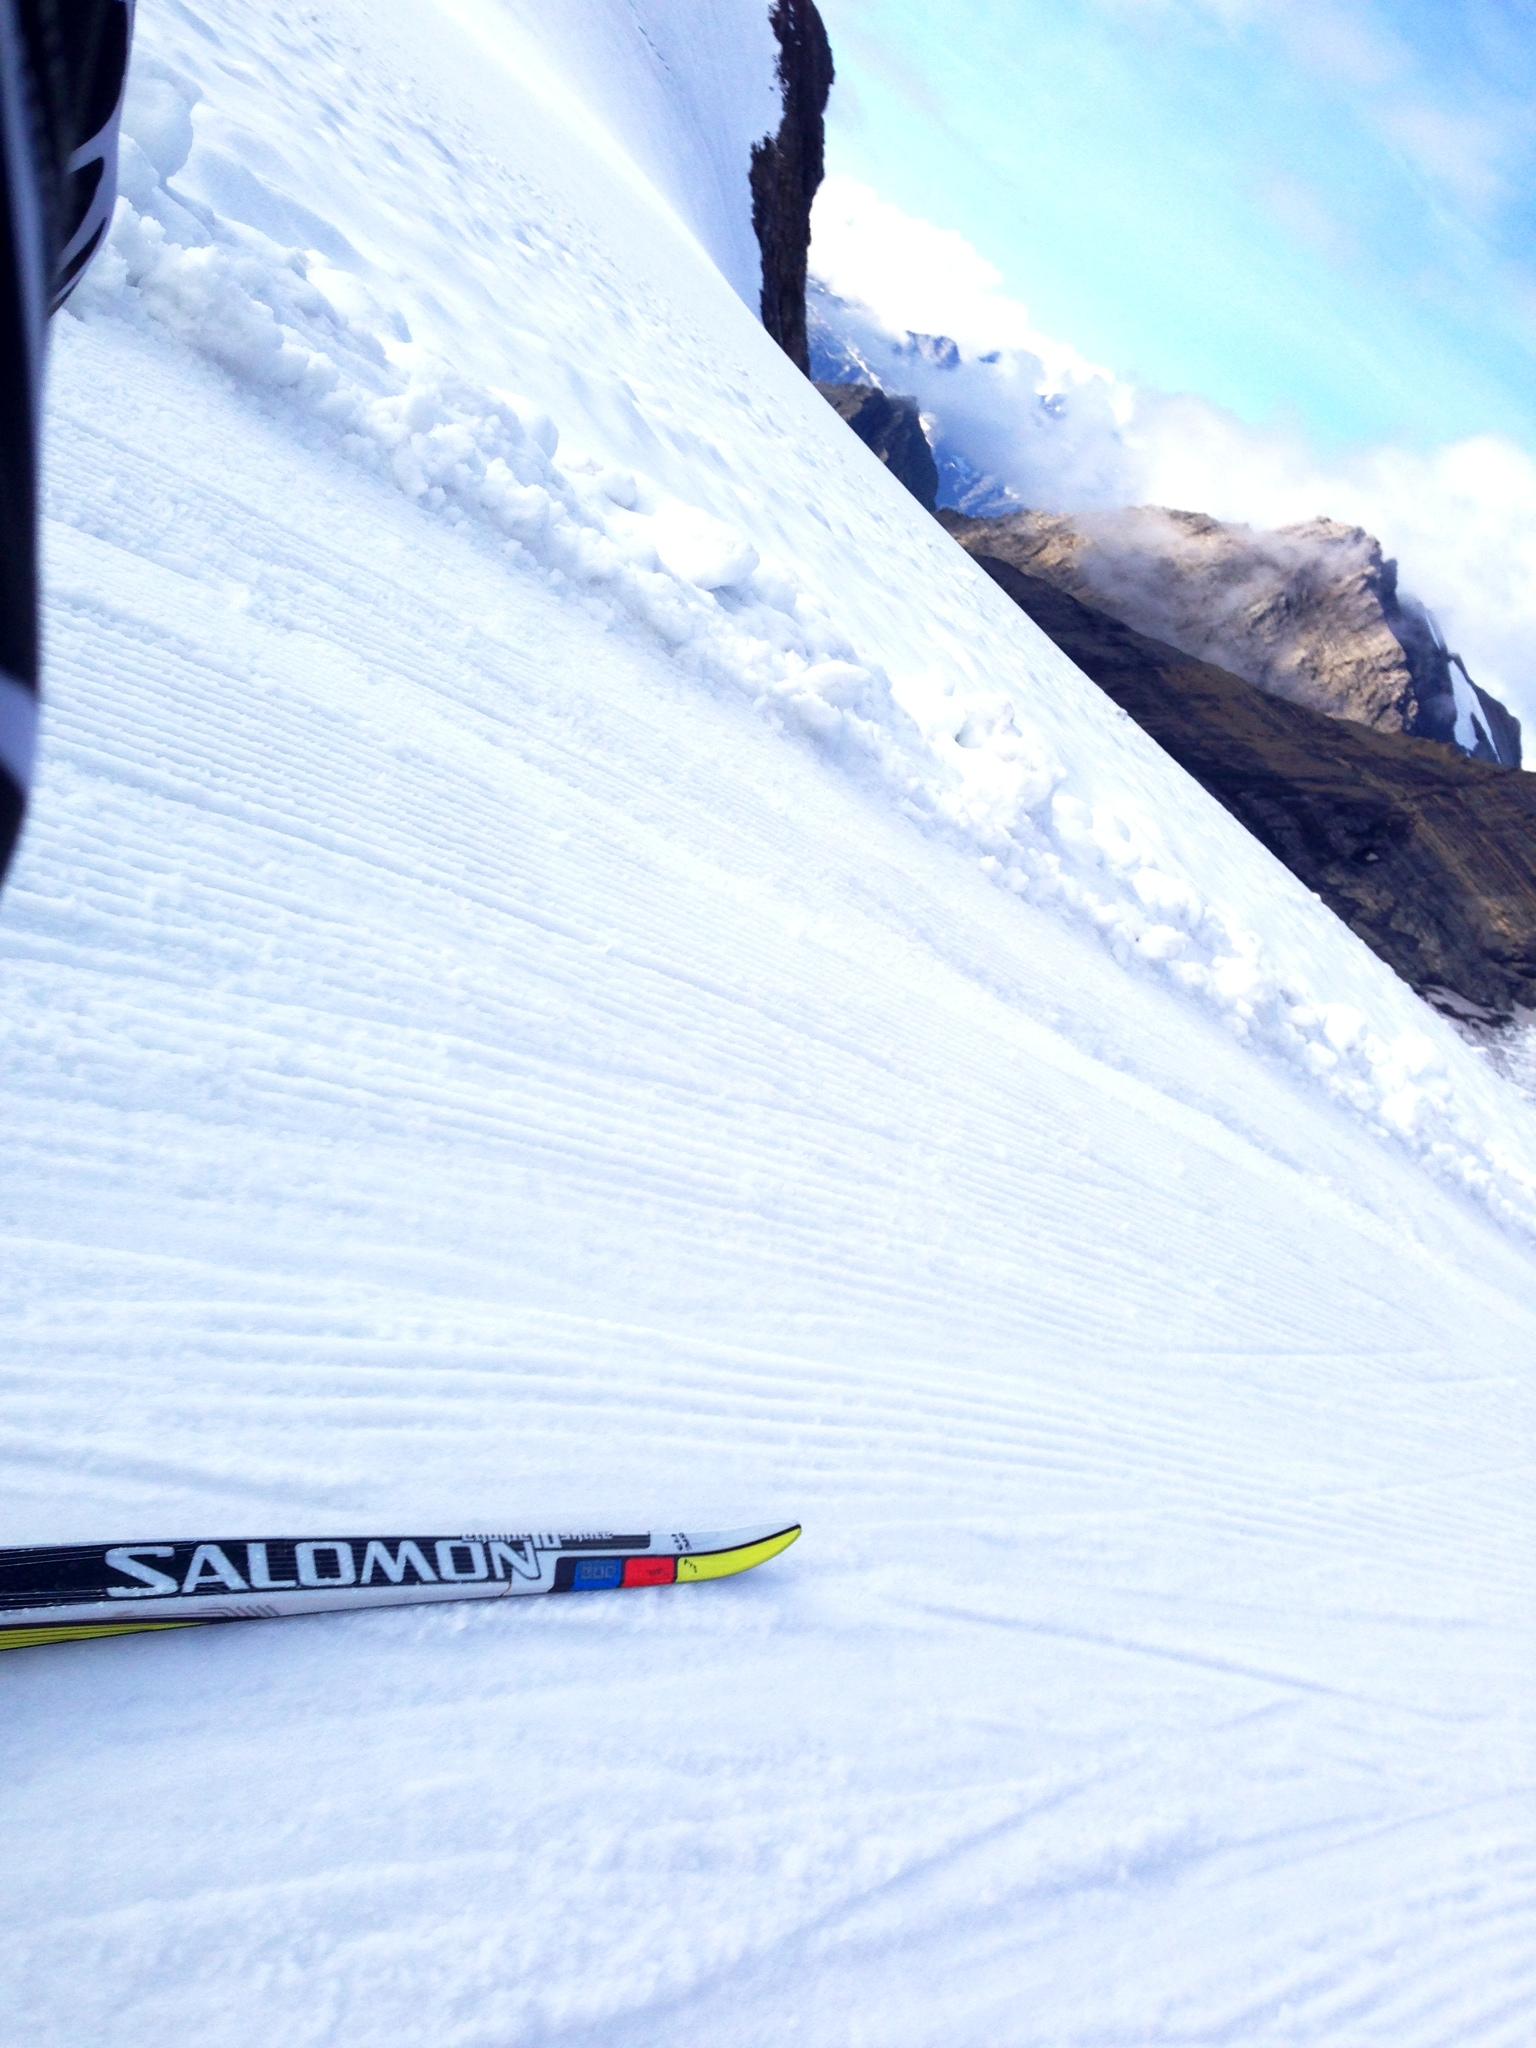 Hard tracks, fast skis, stellar views.